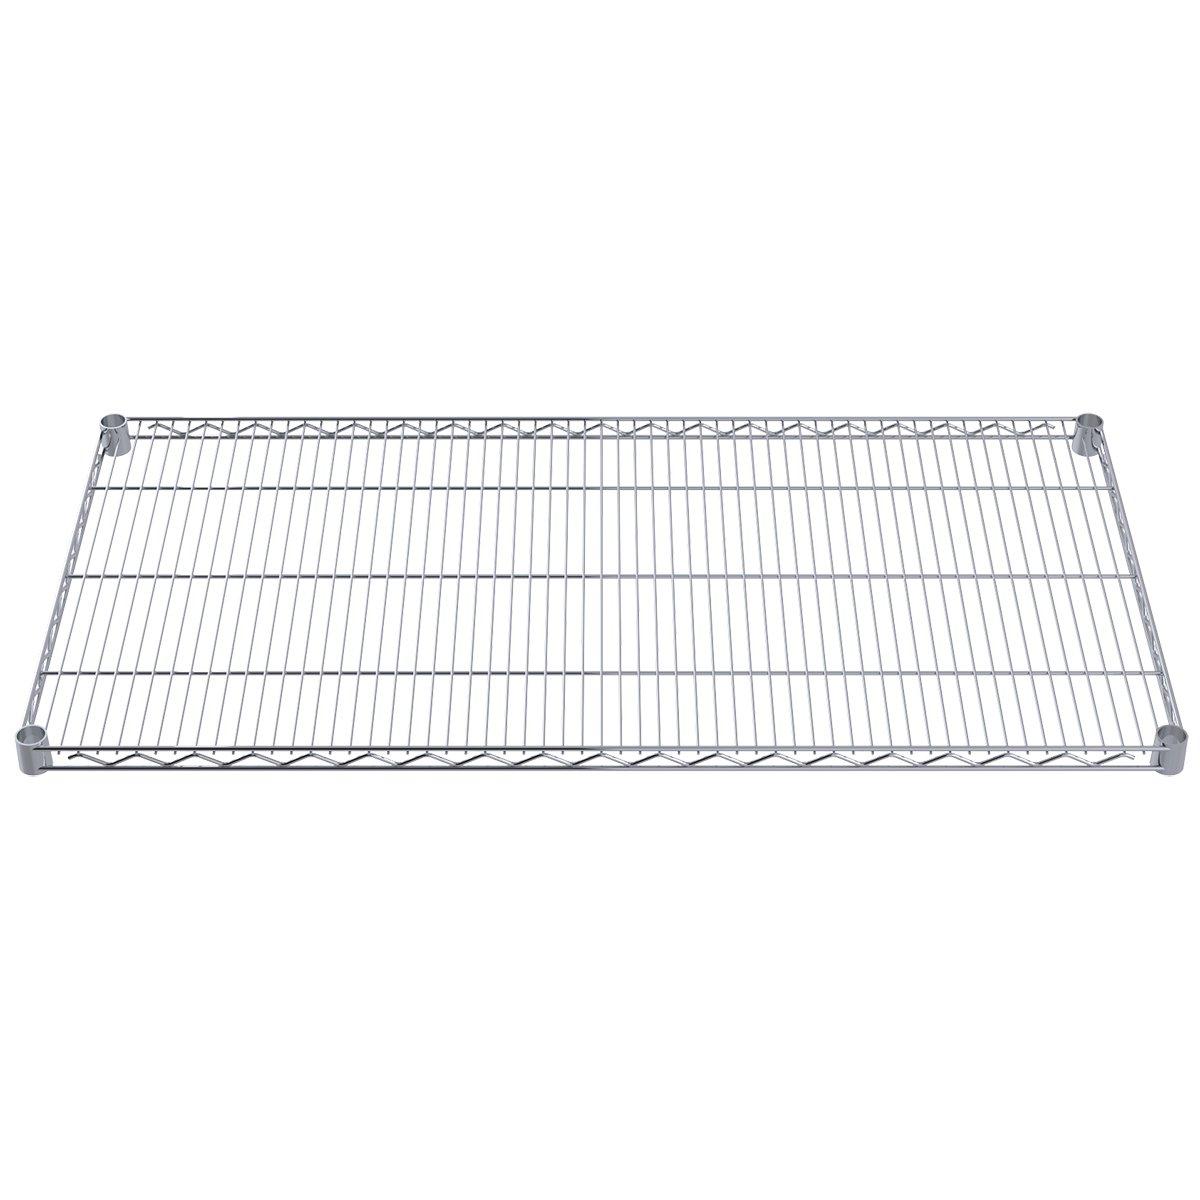 Akro-Mils AWS2448SHELF 24-Inch X 48-Inch NSF Approved Industrial Grade Chrome Wire Shelf, 4-Pack by Akro-Mils